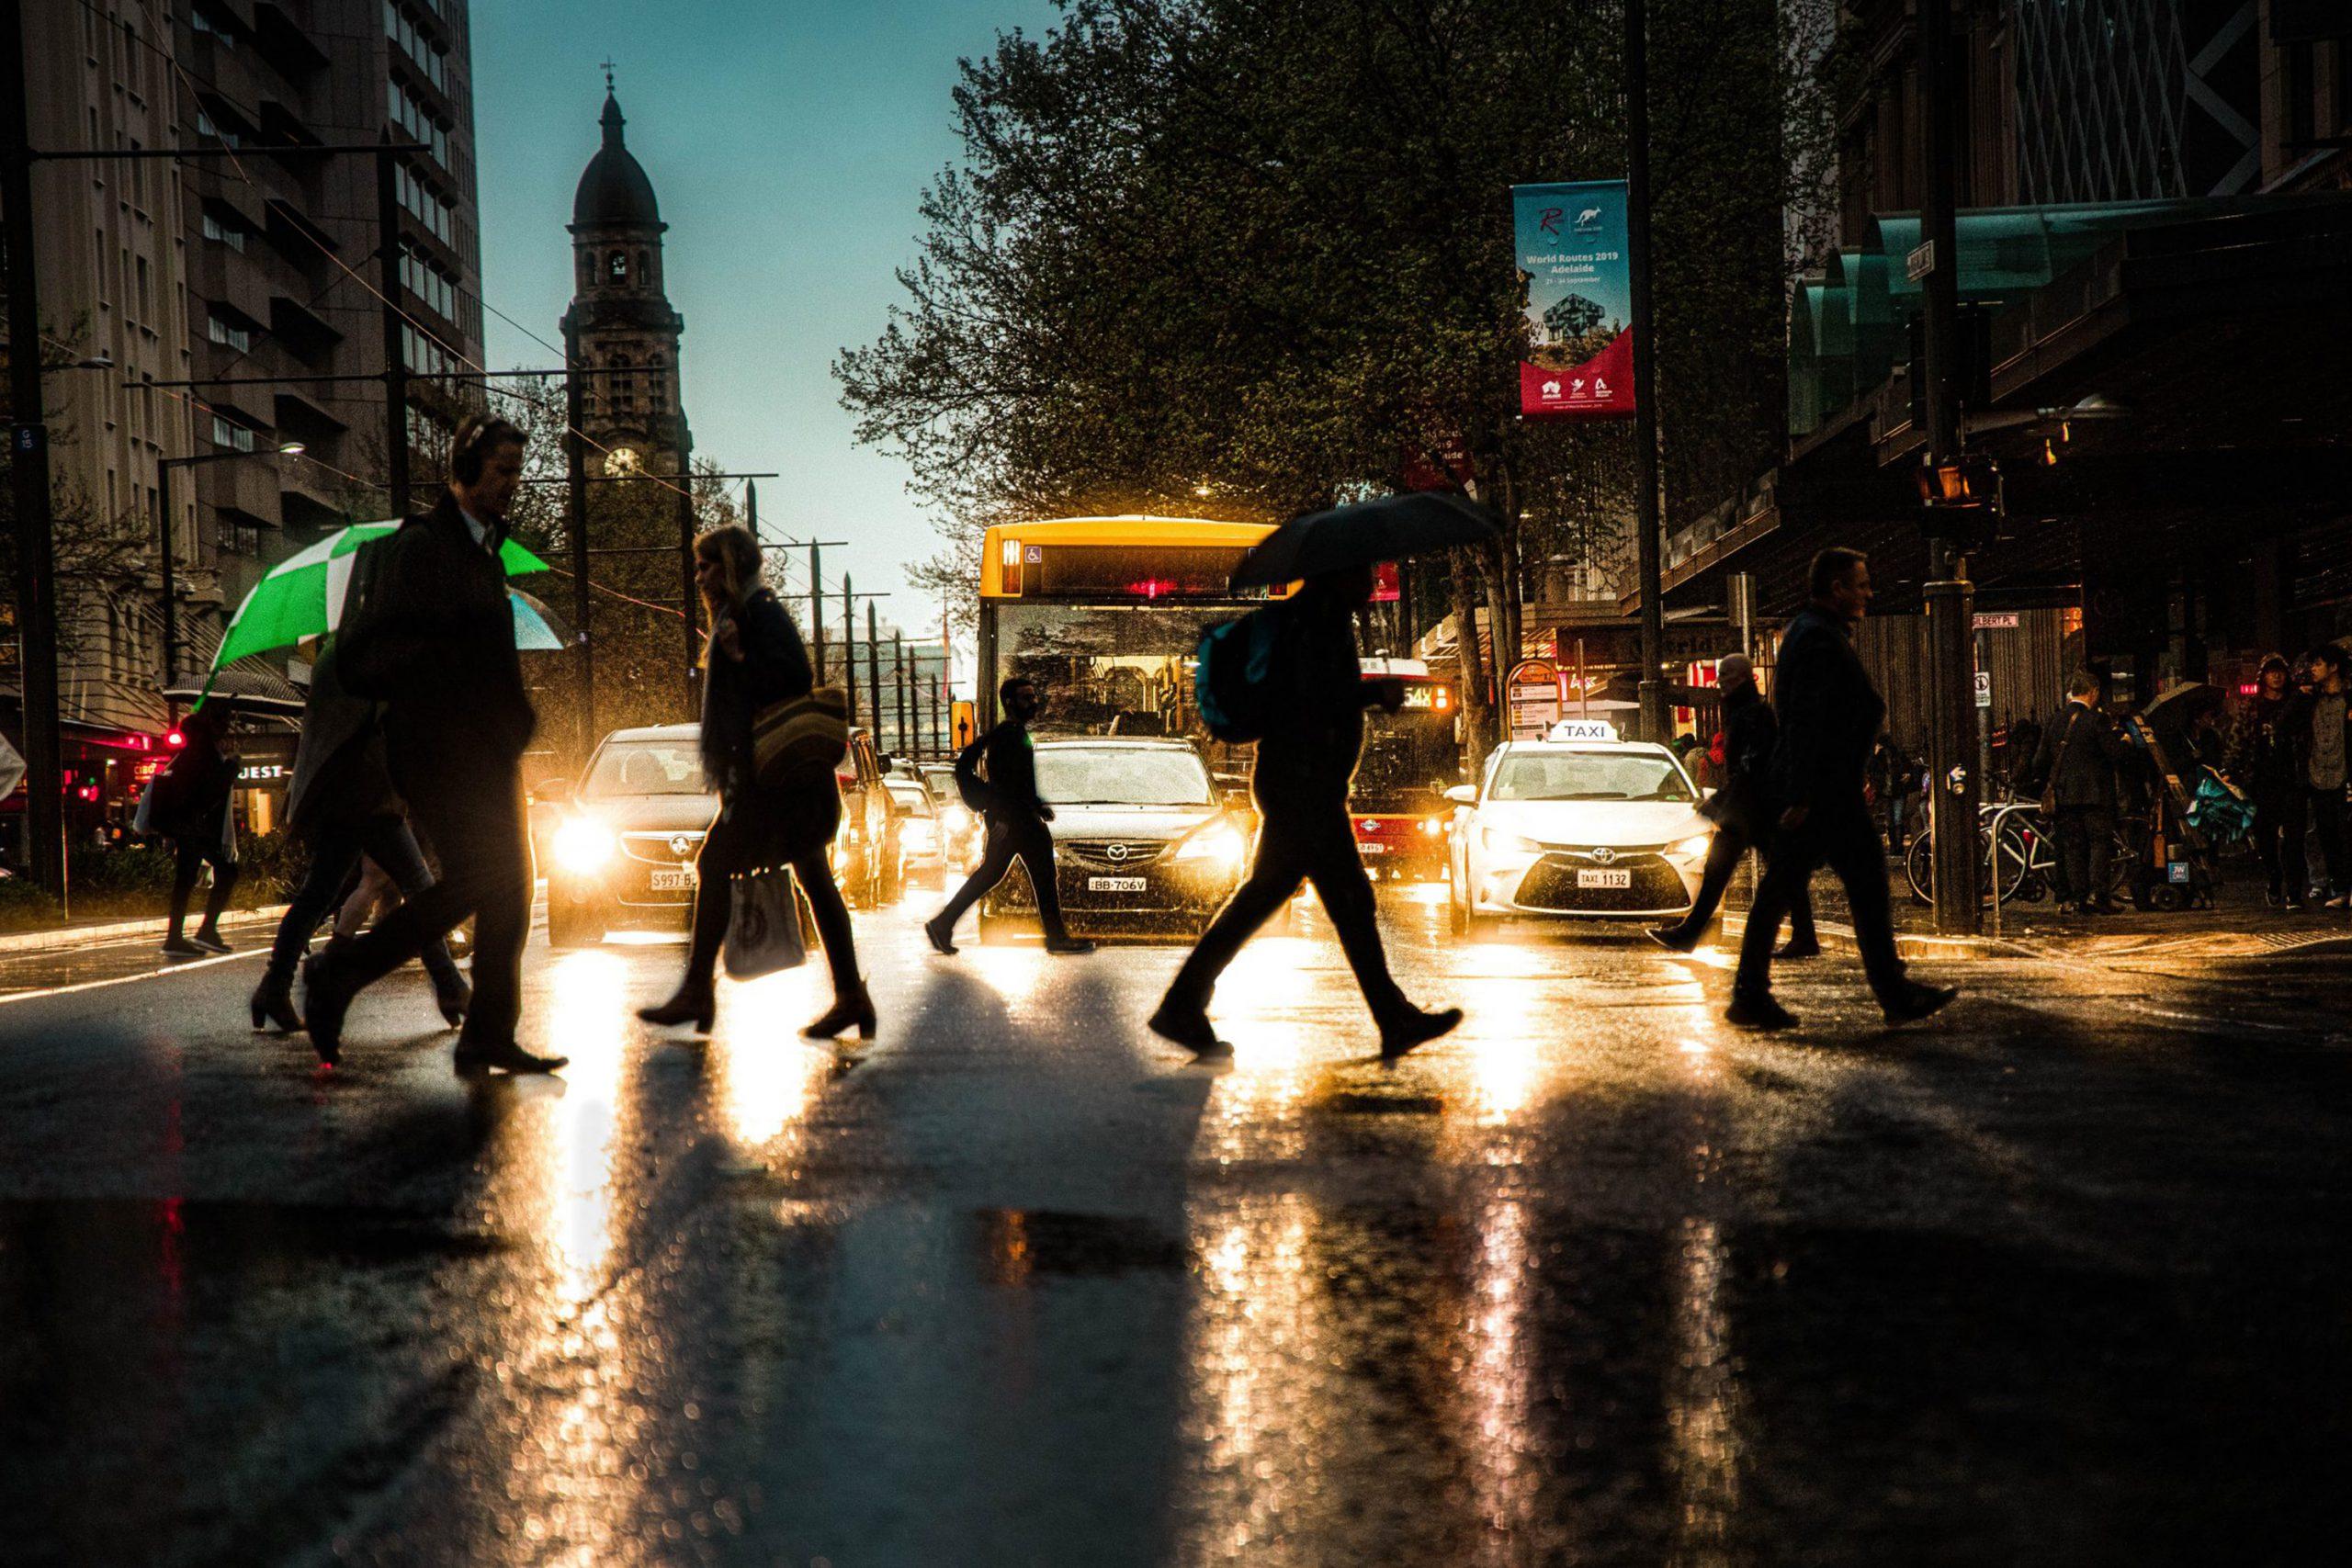 People-walking-on-pedestrain-lane-during-a-rainy-evening